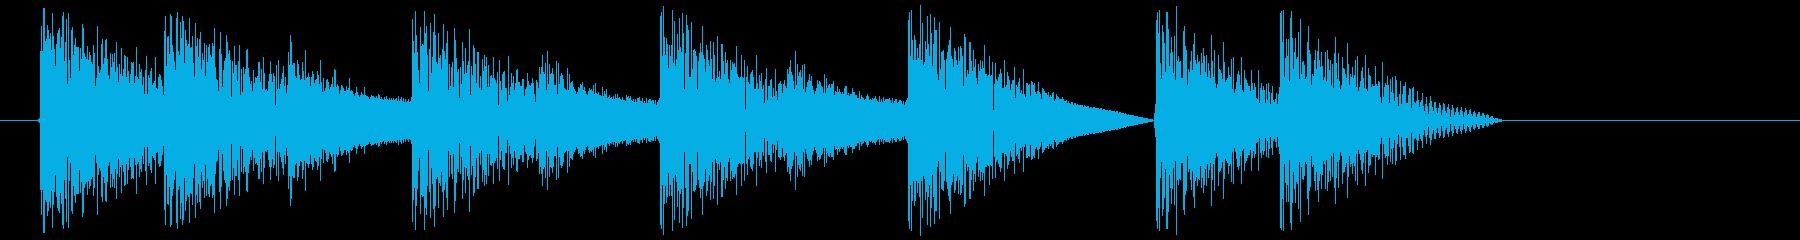 8bitジングル#3スタート&クリアの再生済みの波形